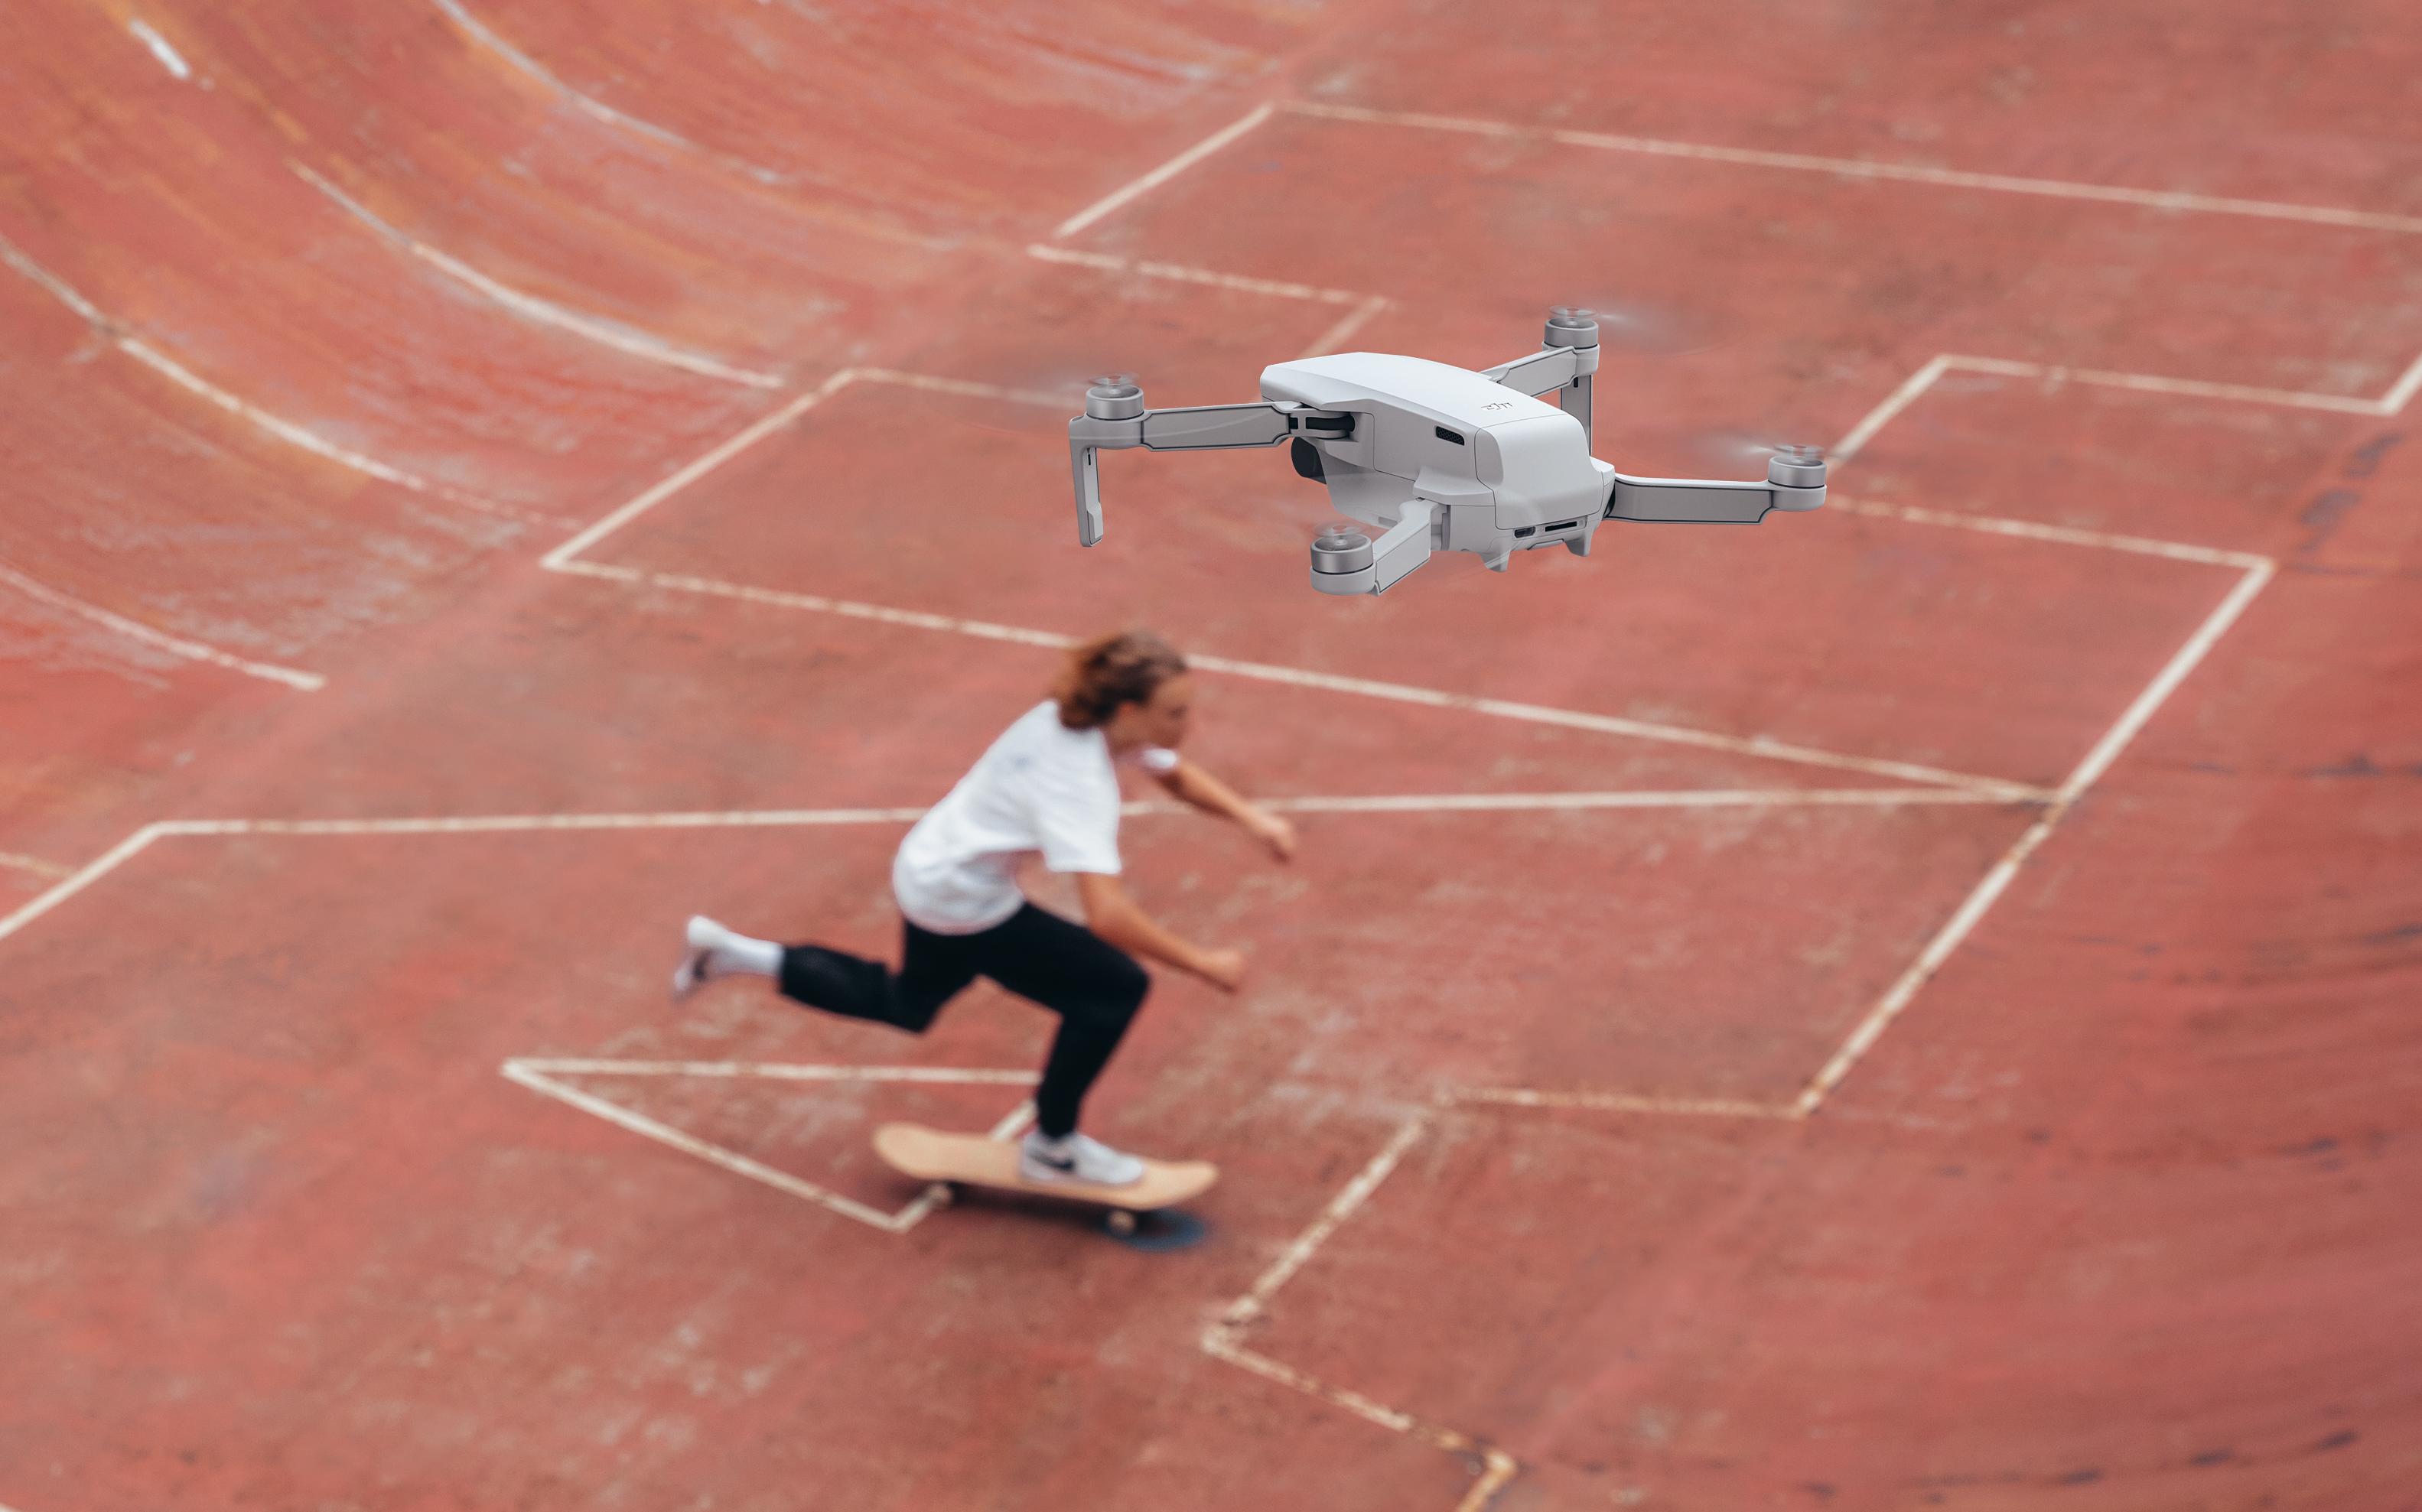 Mavic Mini flycam